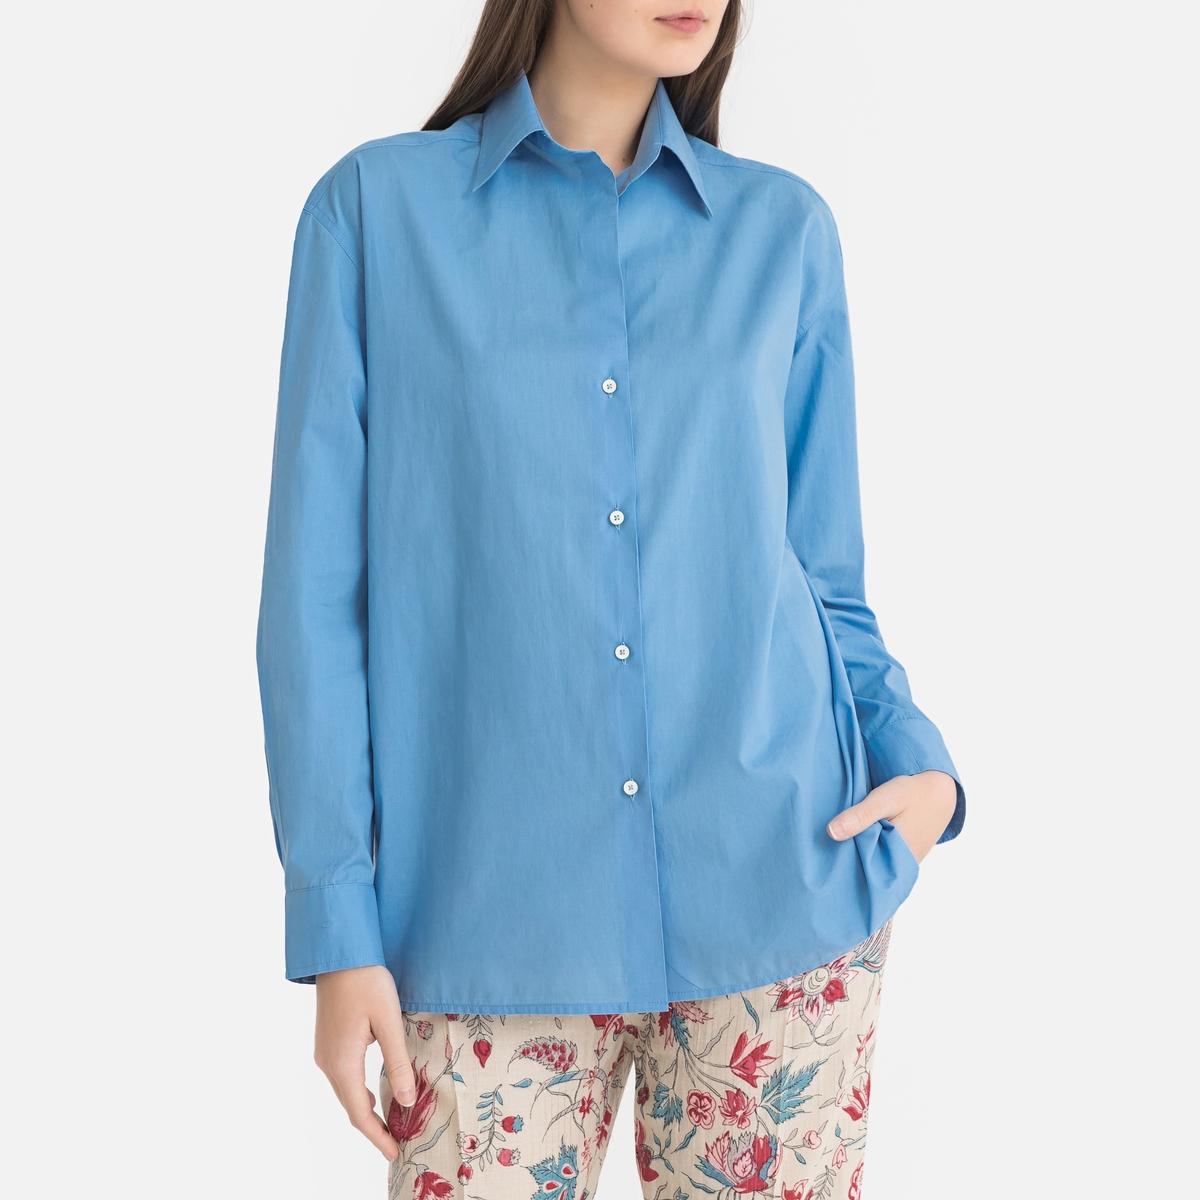 Блузка La Redoute С длинными рукавами 2(M) синий бао ло фади моды baoluofadi случайный с длинными рукавами пуловер свитер синий xxl m 155 101 302